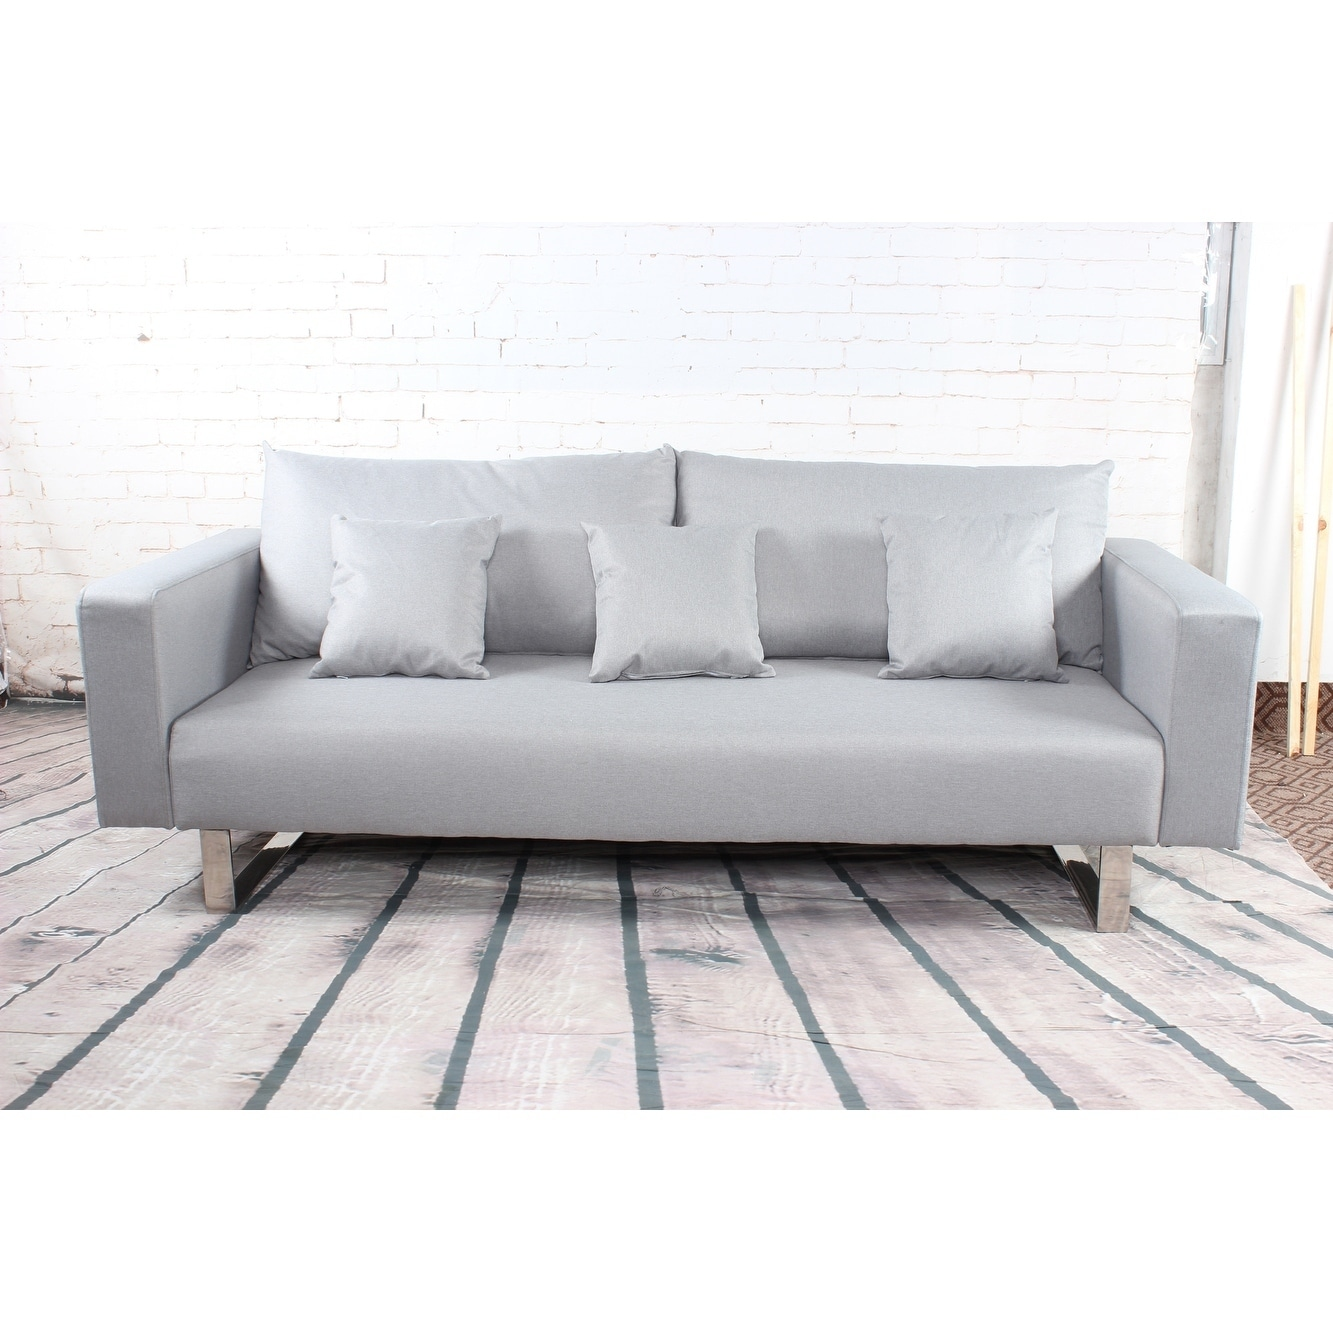 Modern Grey Sleeper Sofa